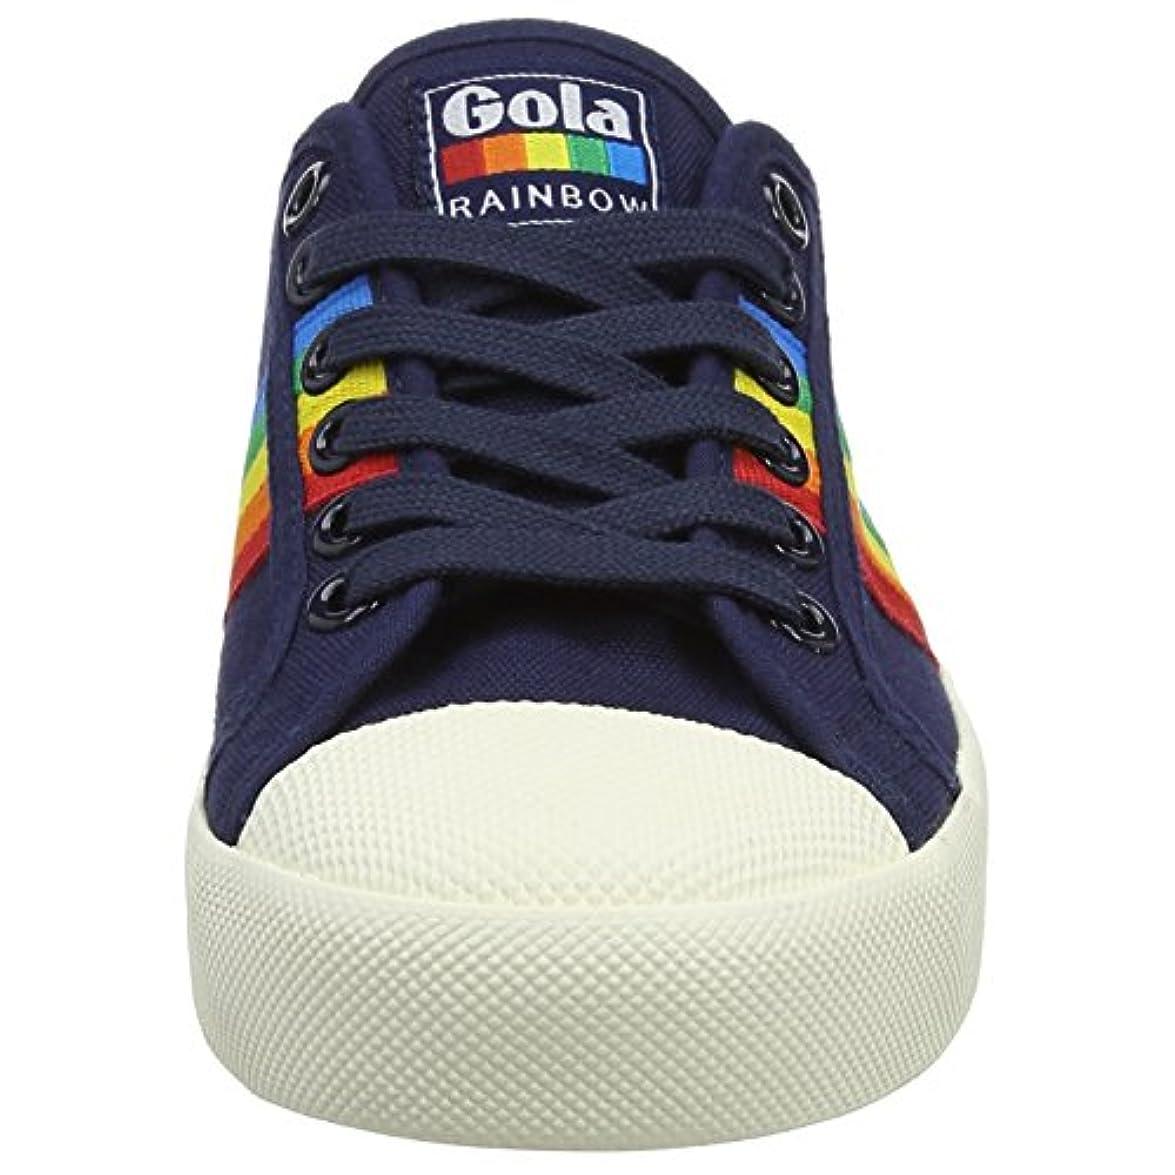 Gola Coaster Rainbow Navy multi Sneaker Donna